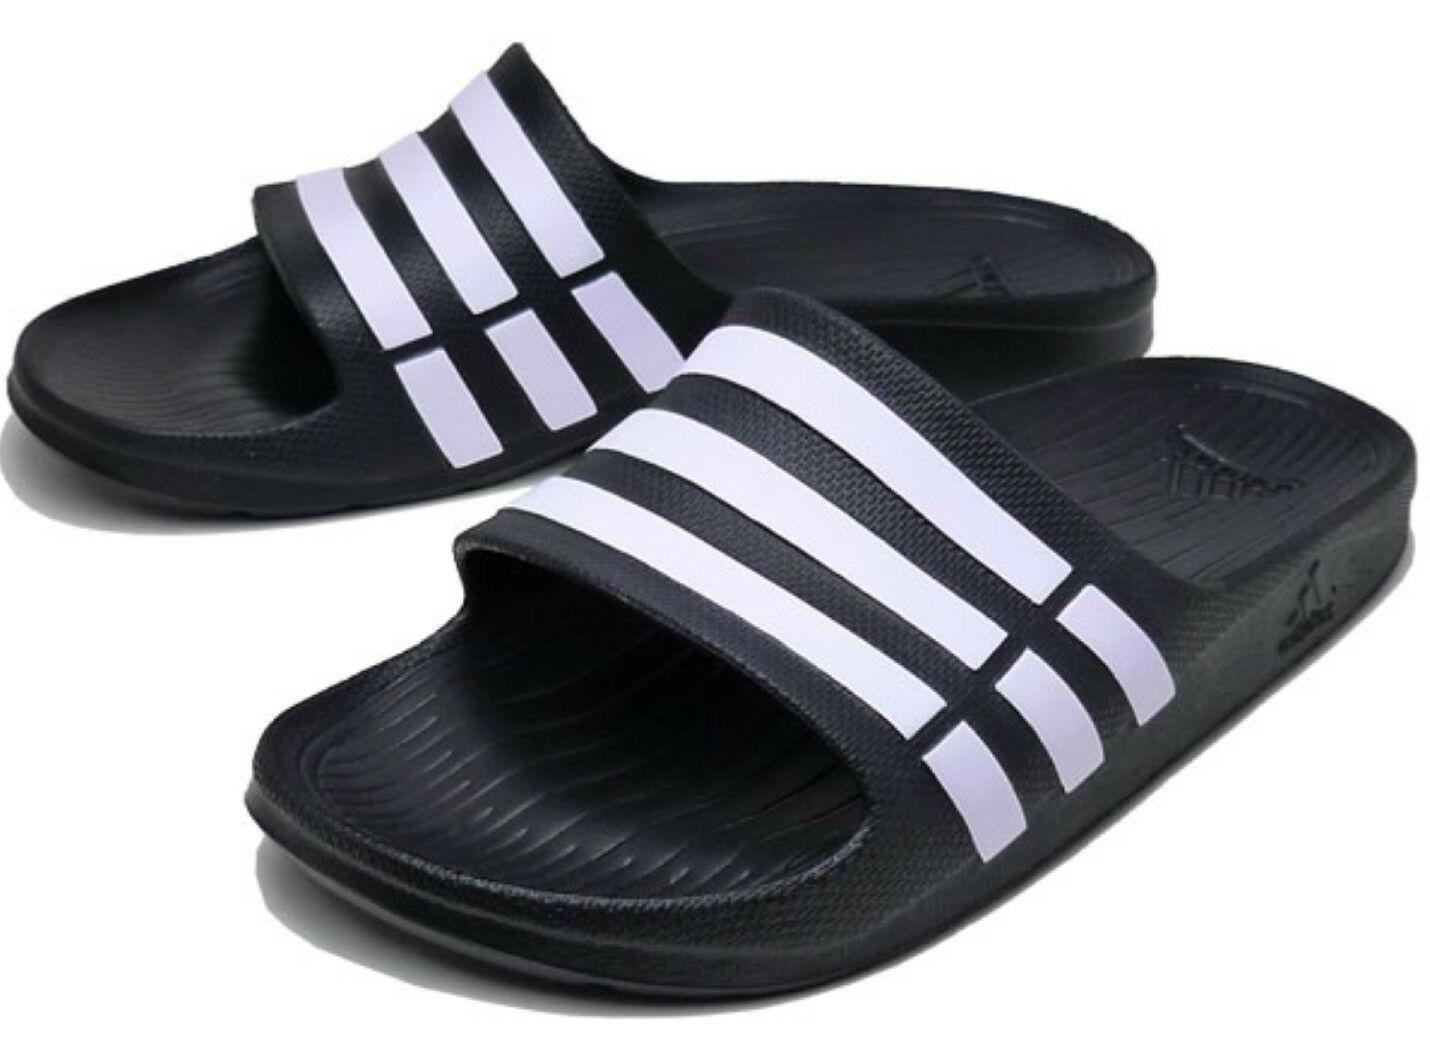 Adidas Duramo G15890 Black White Slides Sandals Flip Flops Shower Pool Shoes